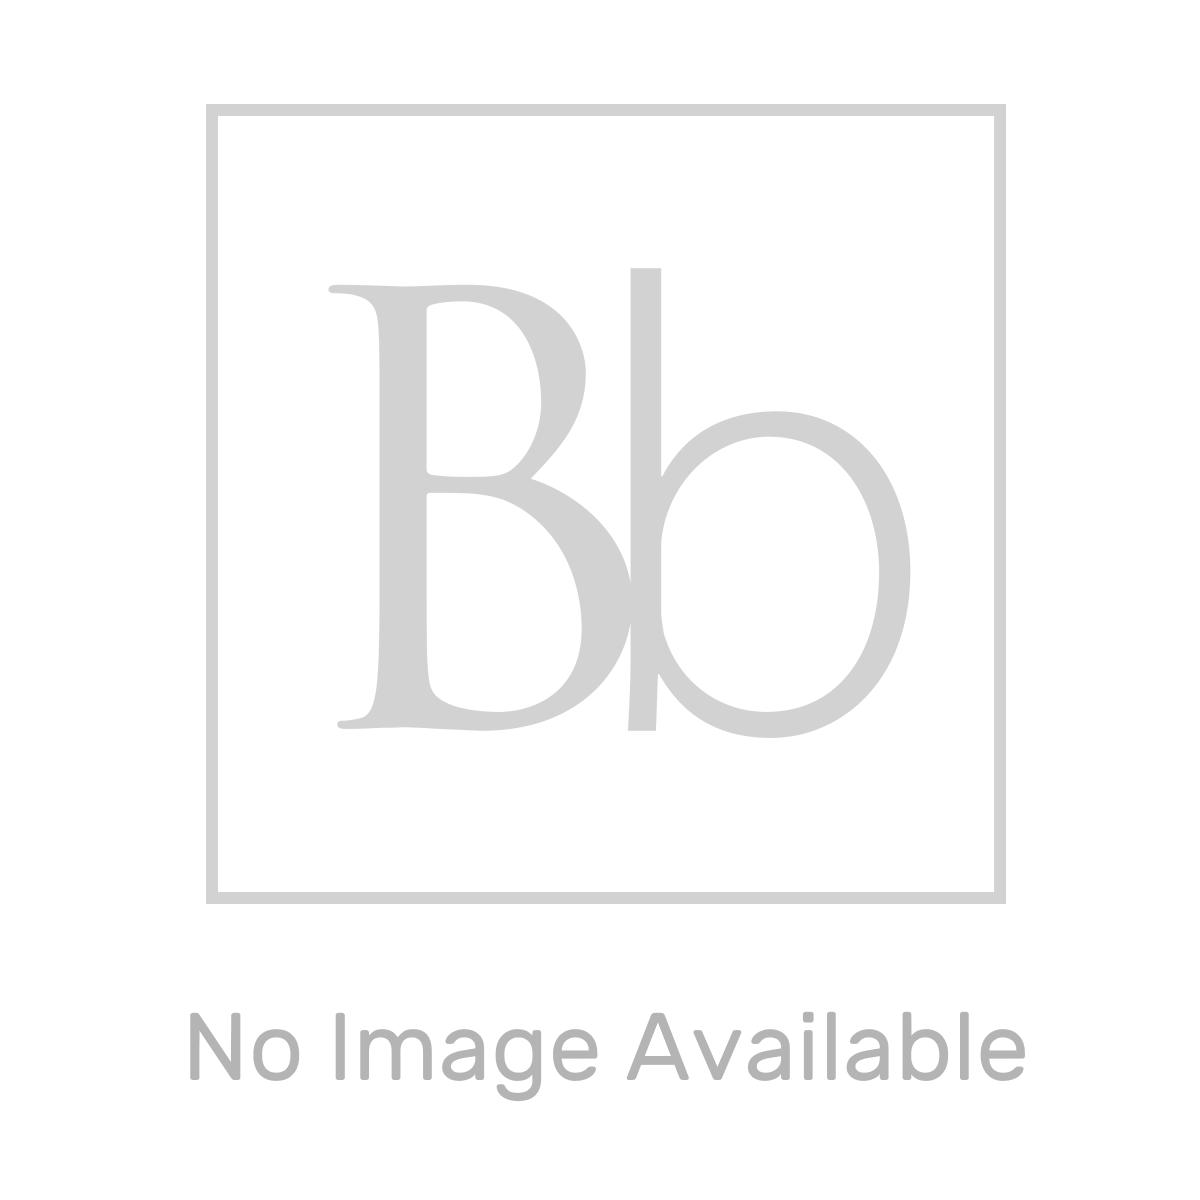 RAK Feeling Black Rectangular Shower Tray 1800 x 800mm Measurements